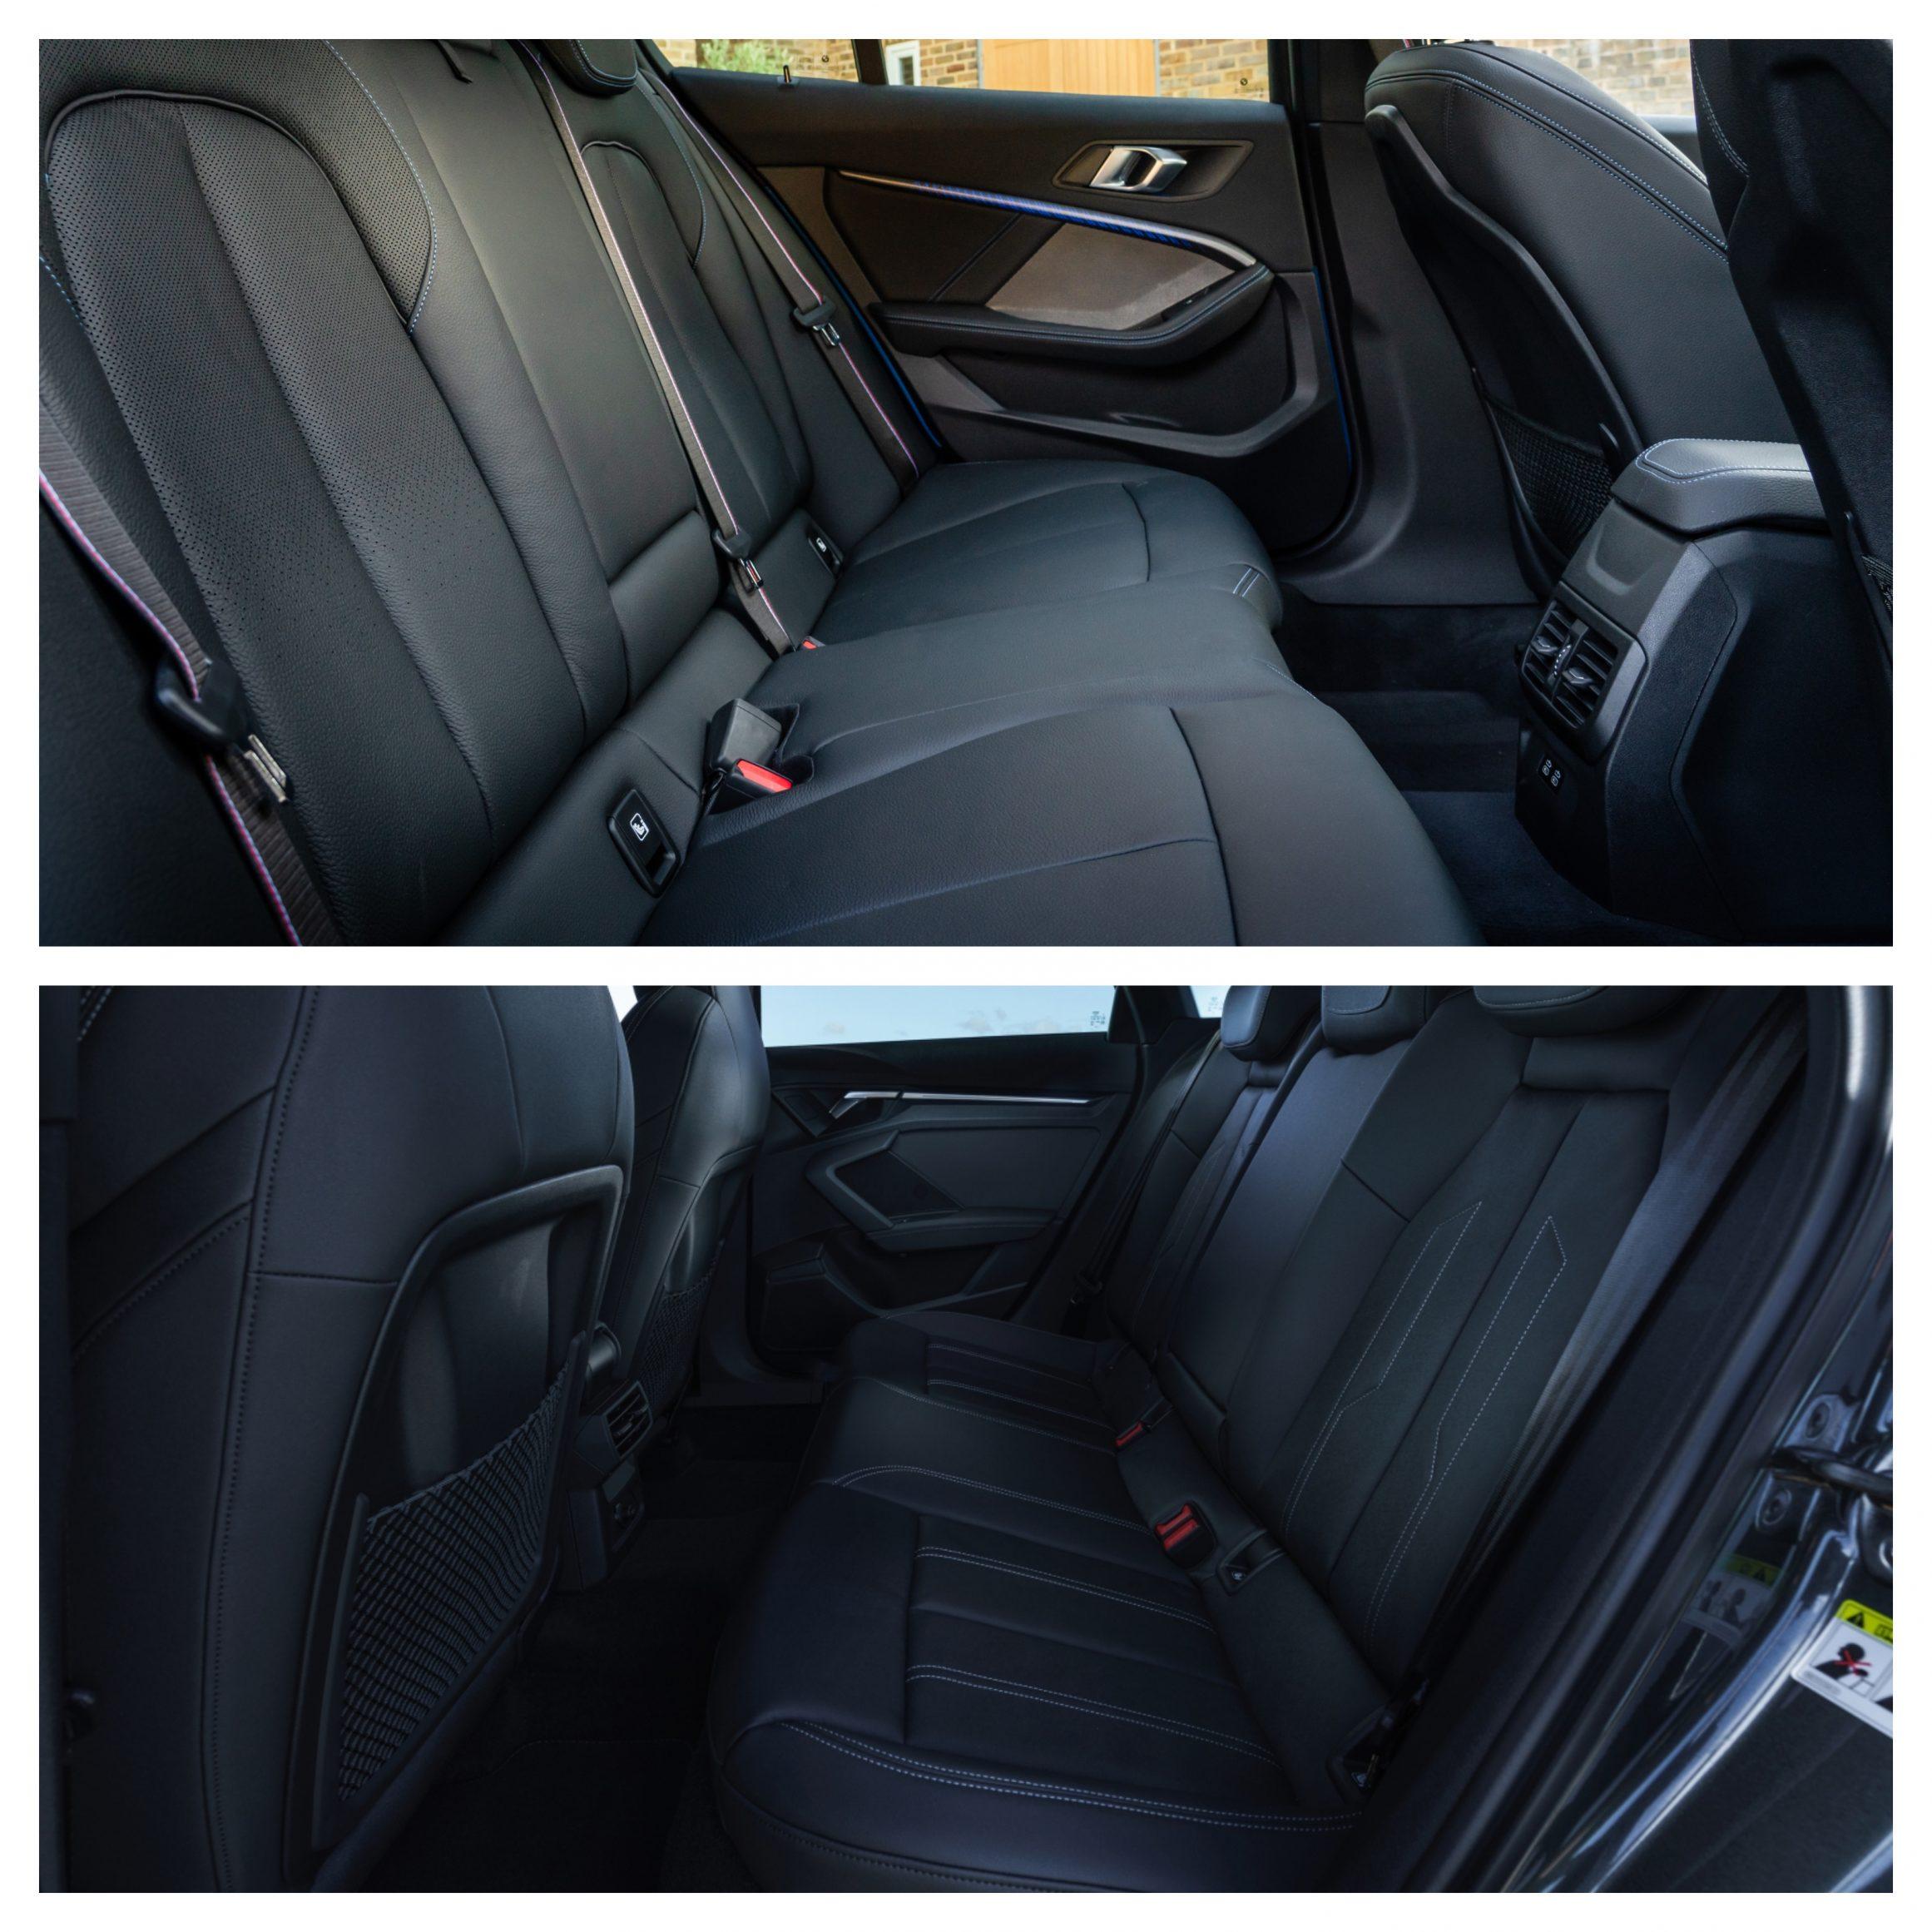 BMW 1 Series Vs Audi A3 - interior space